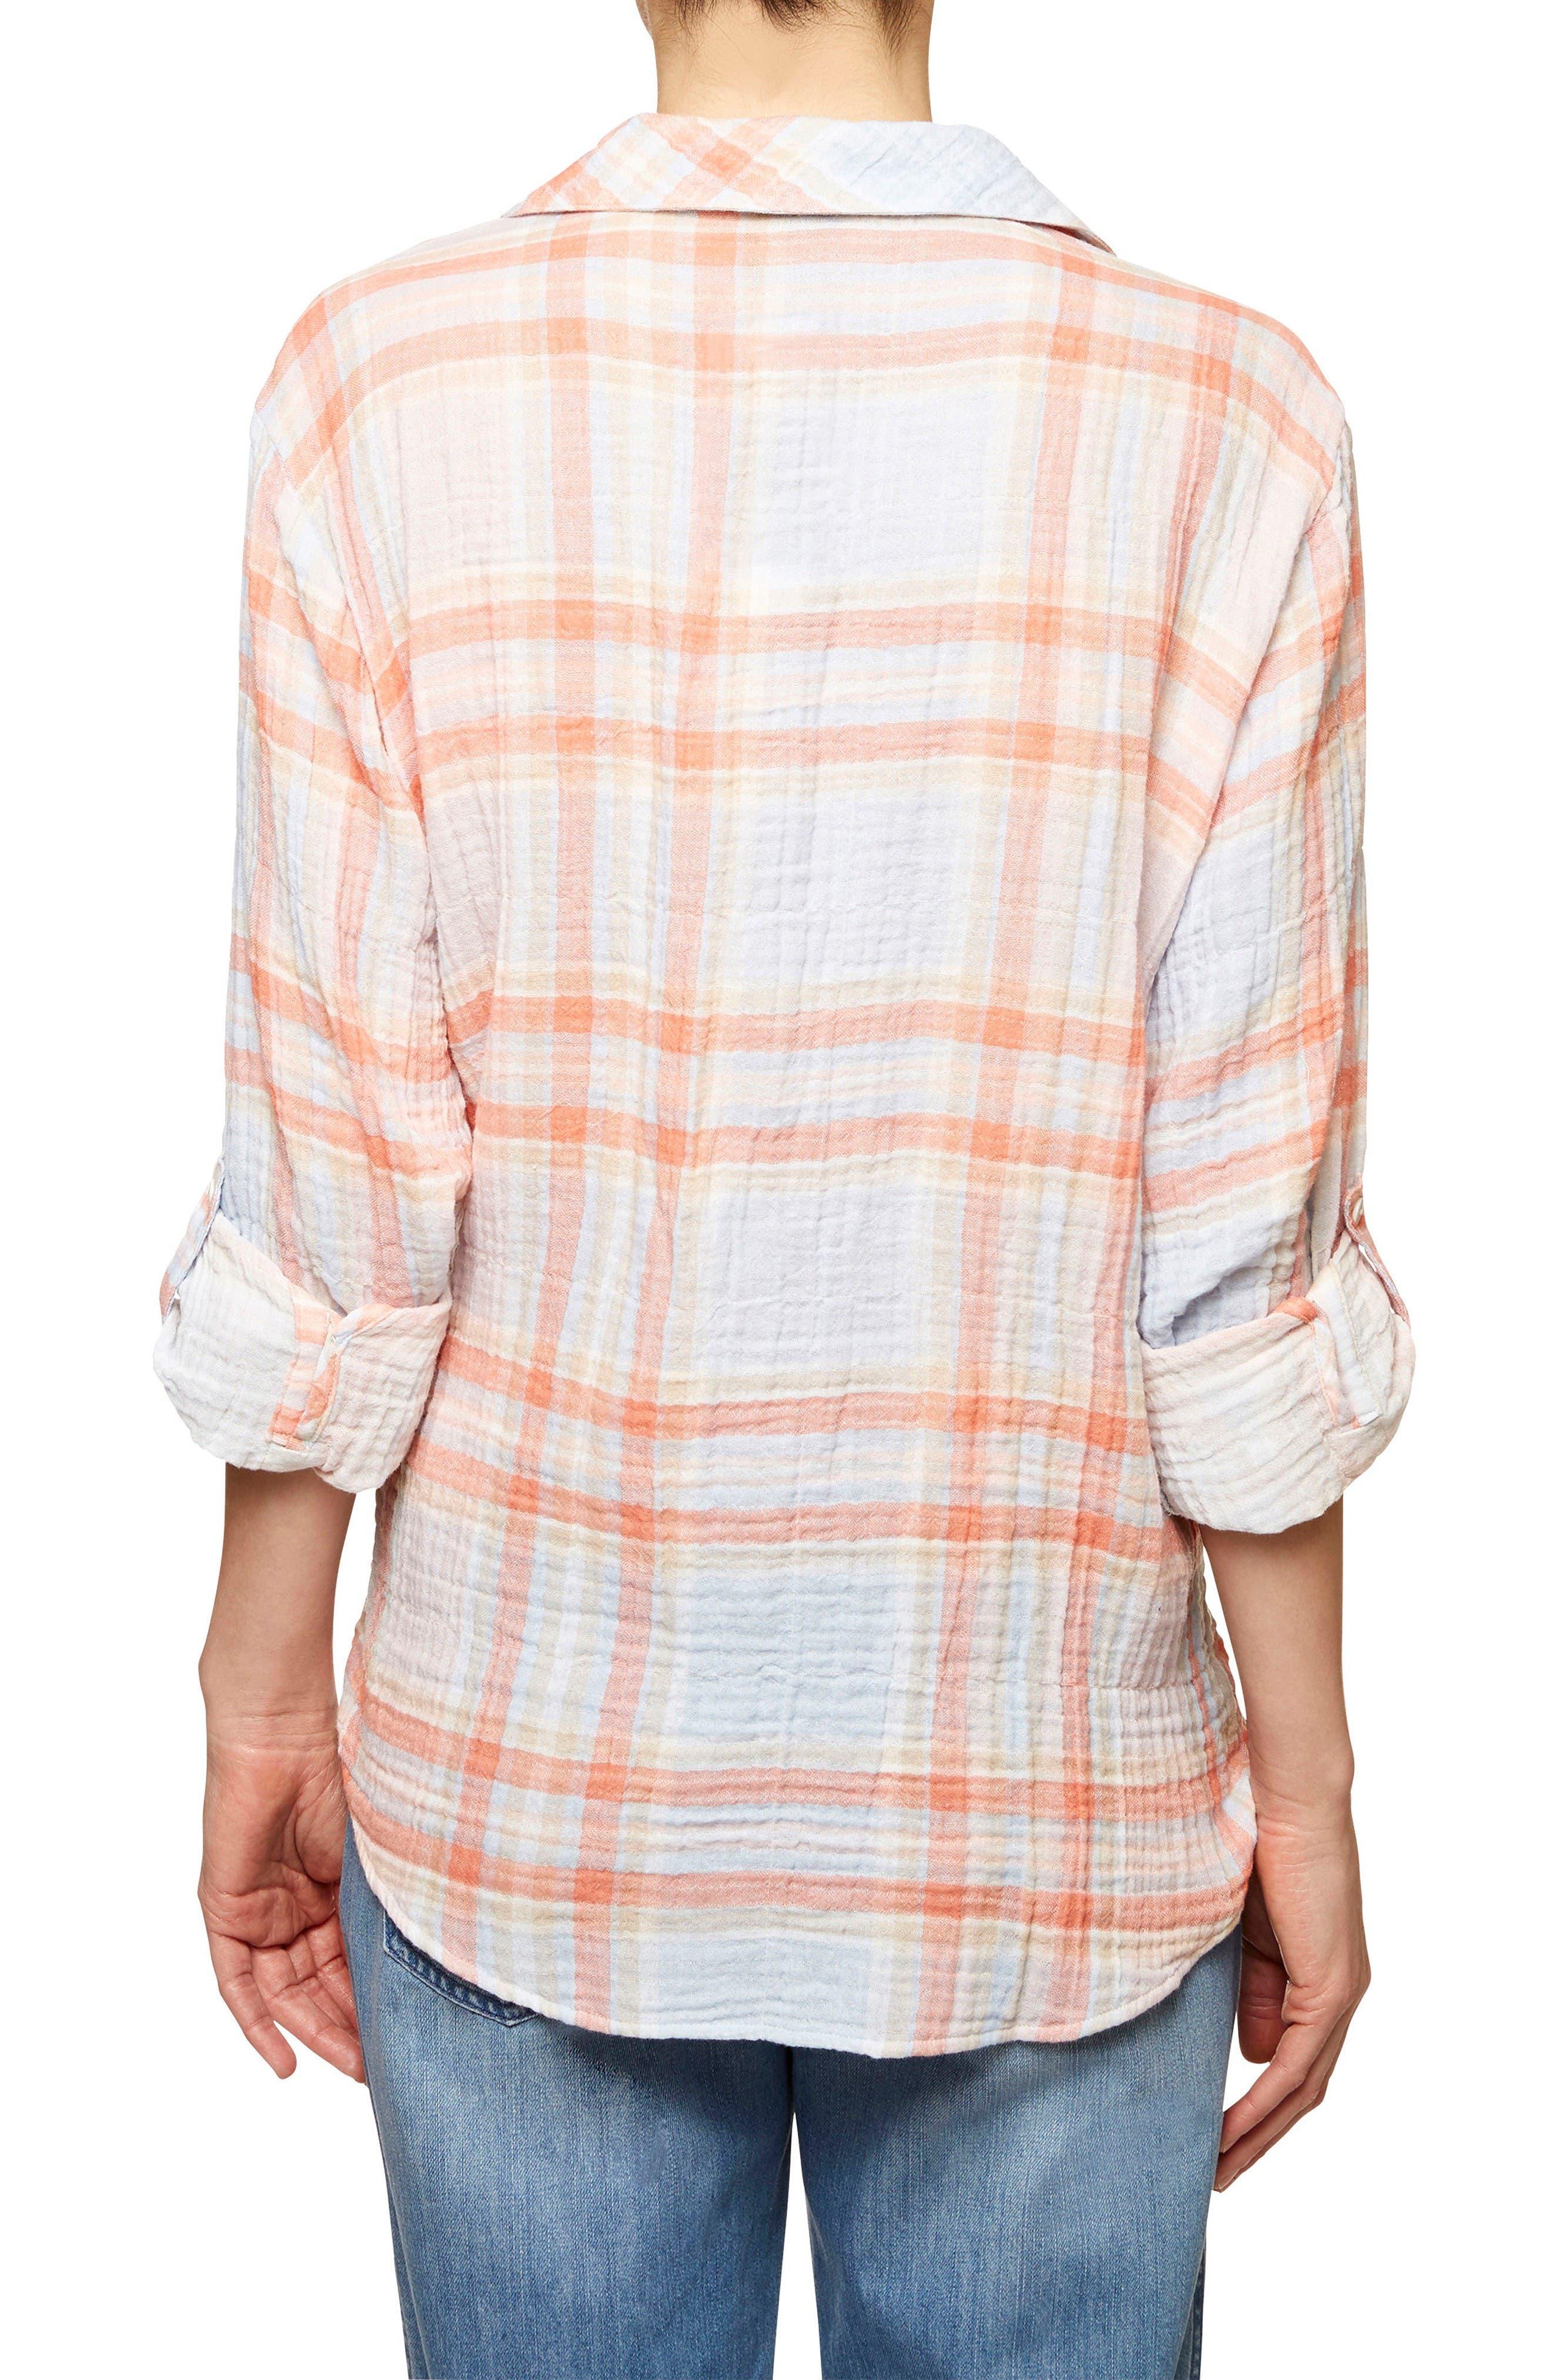 Steady Boyfriend Plaid Shirt,                             Alternate thumbnail 3, color,                             Nina Plaid